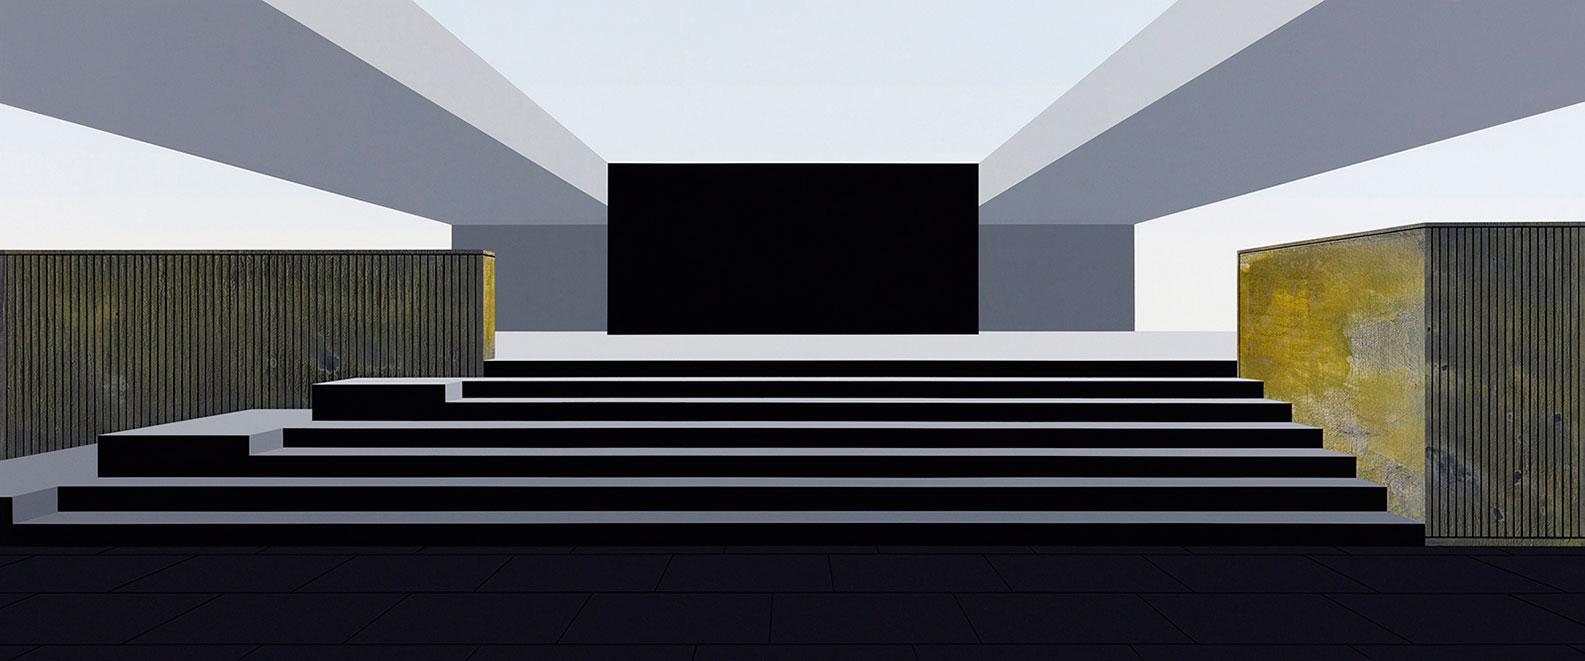 "Henrik Samuelsson, ""Core"", 2016. Mixed media on canvas, 100 x 240 cm"